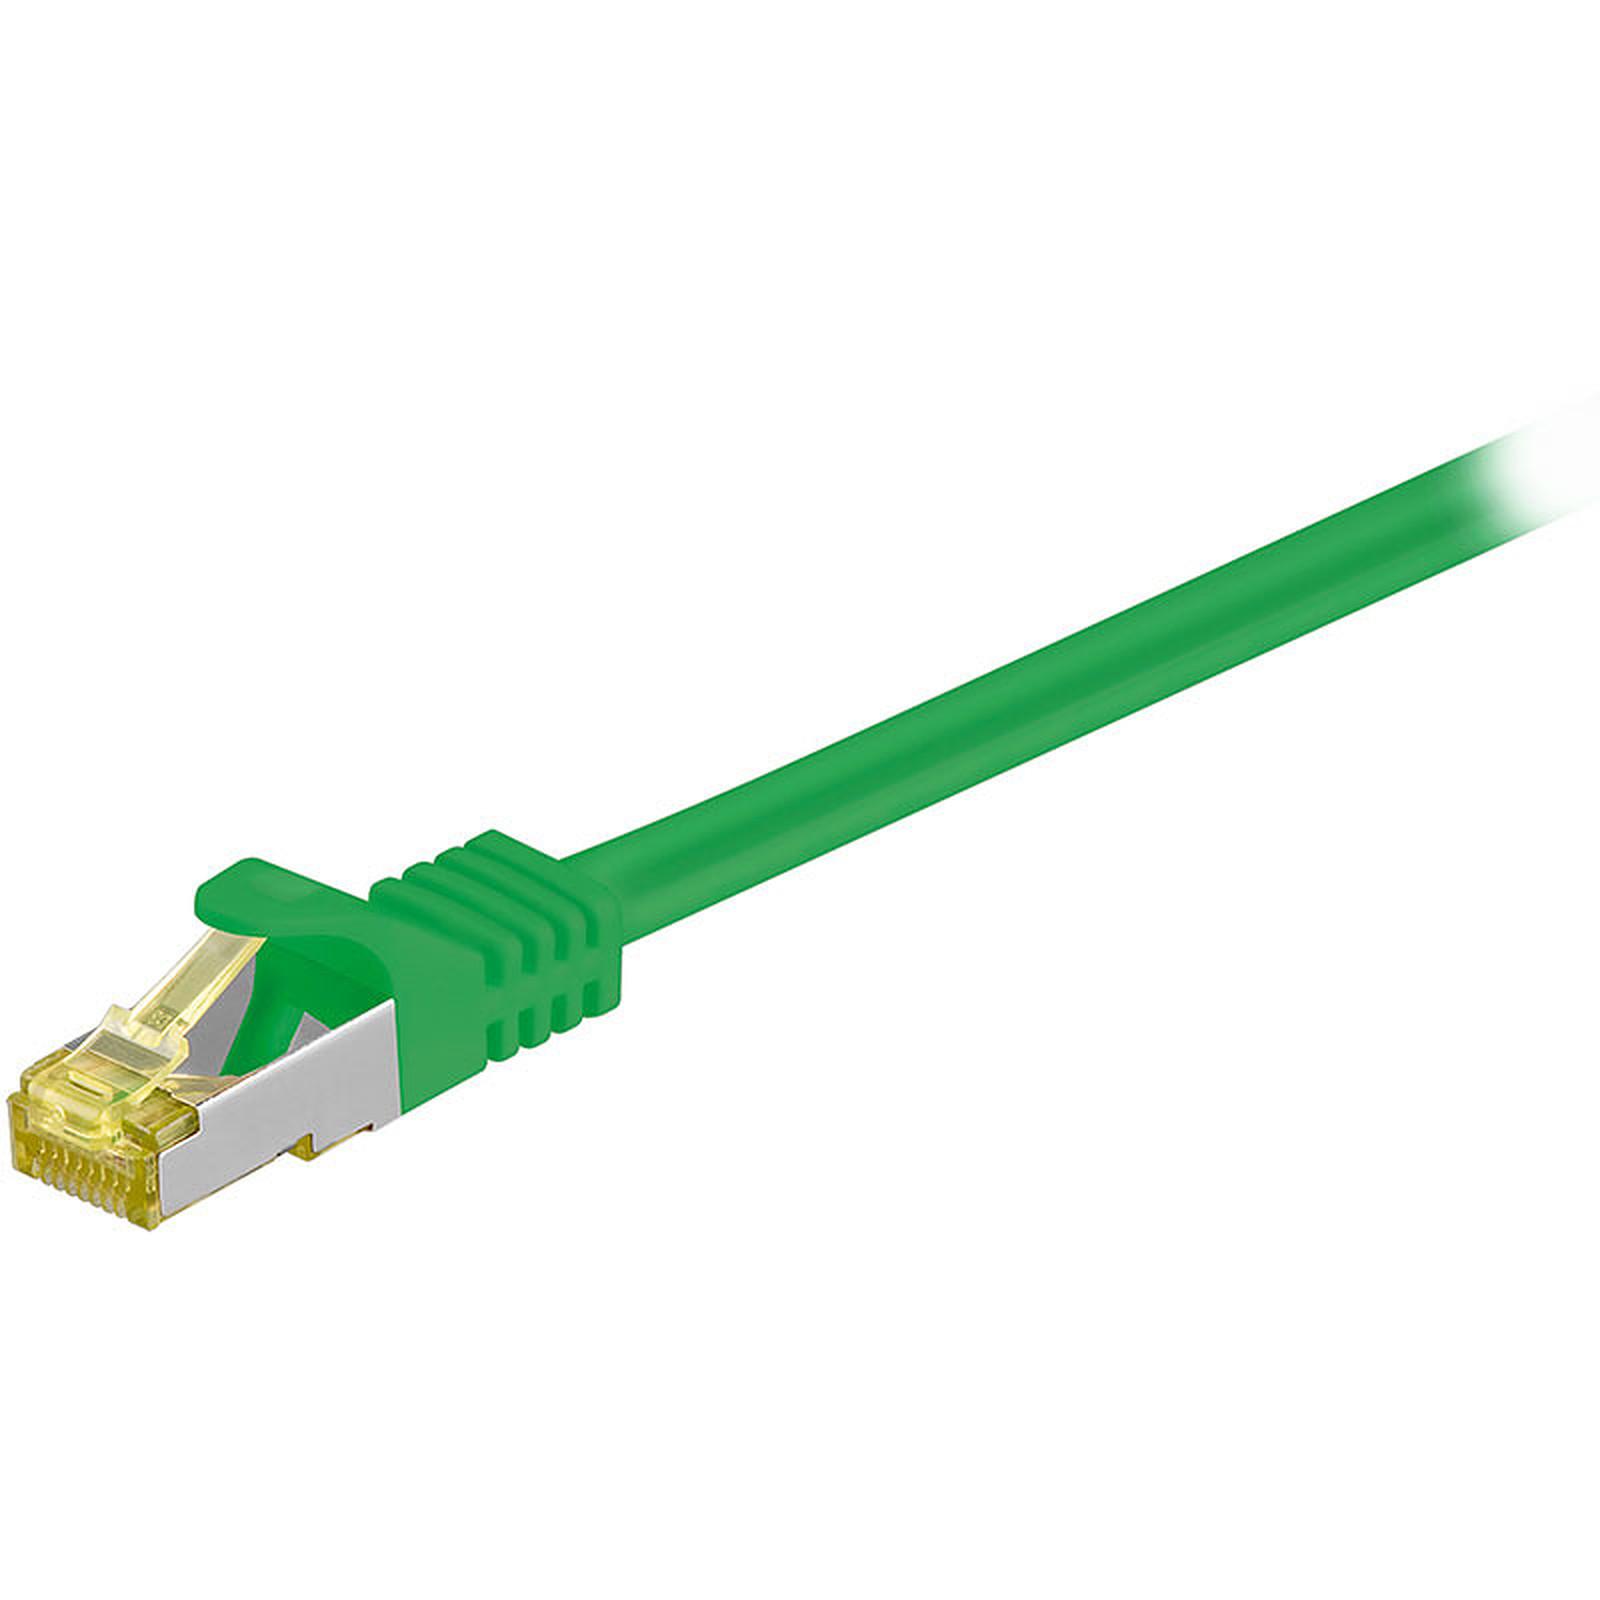 Cable RJ45 categoría 7 S/FTP 5 m (verde)